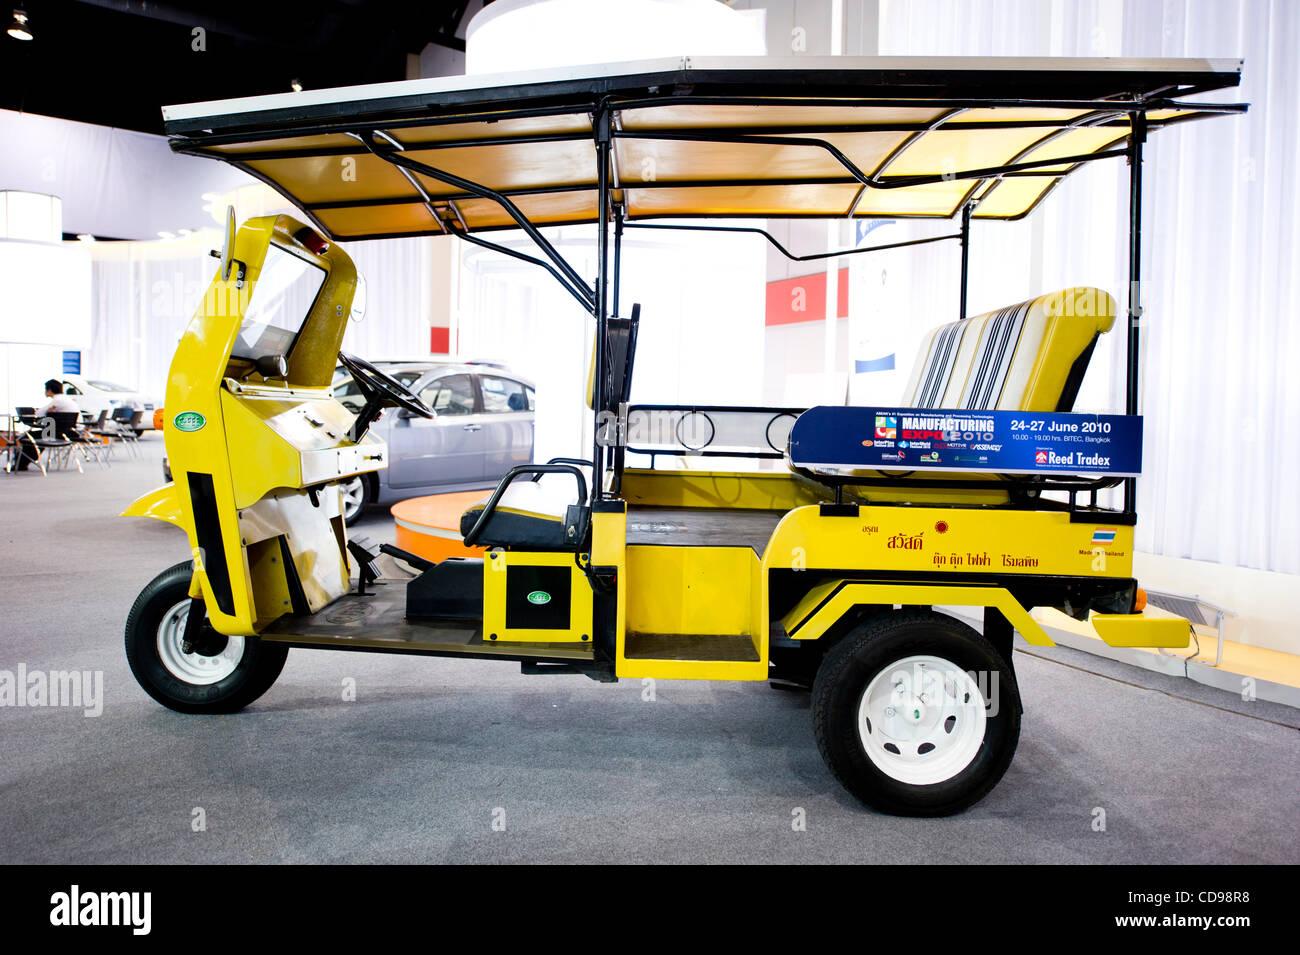 June 25, 2010 - Bangkok, Thailand - Thailand 1st solar powered auto ...